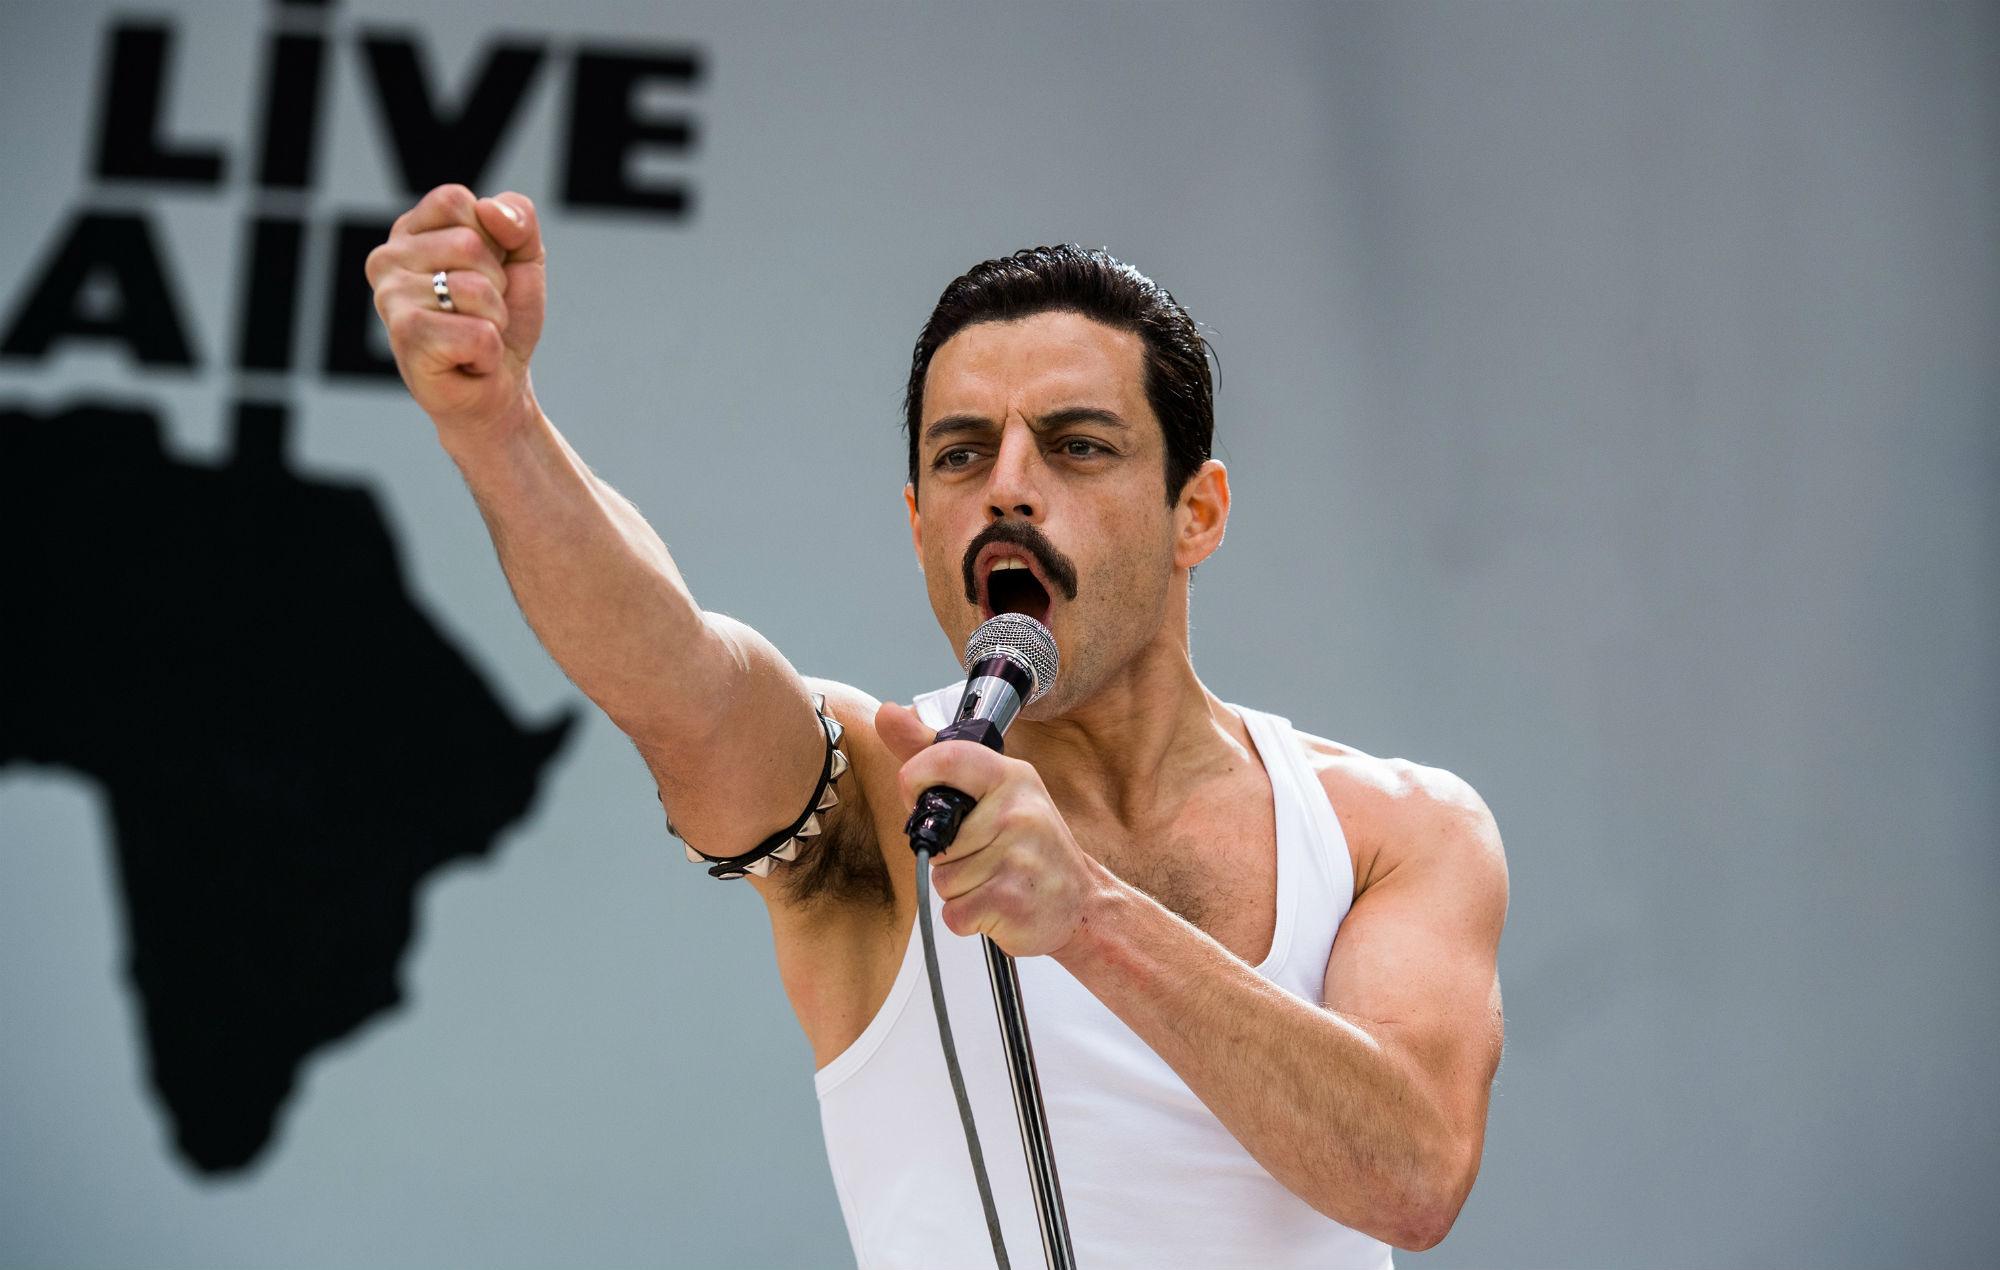 Rami Malek Bohemian Rhapsody diet exercise regime